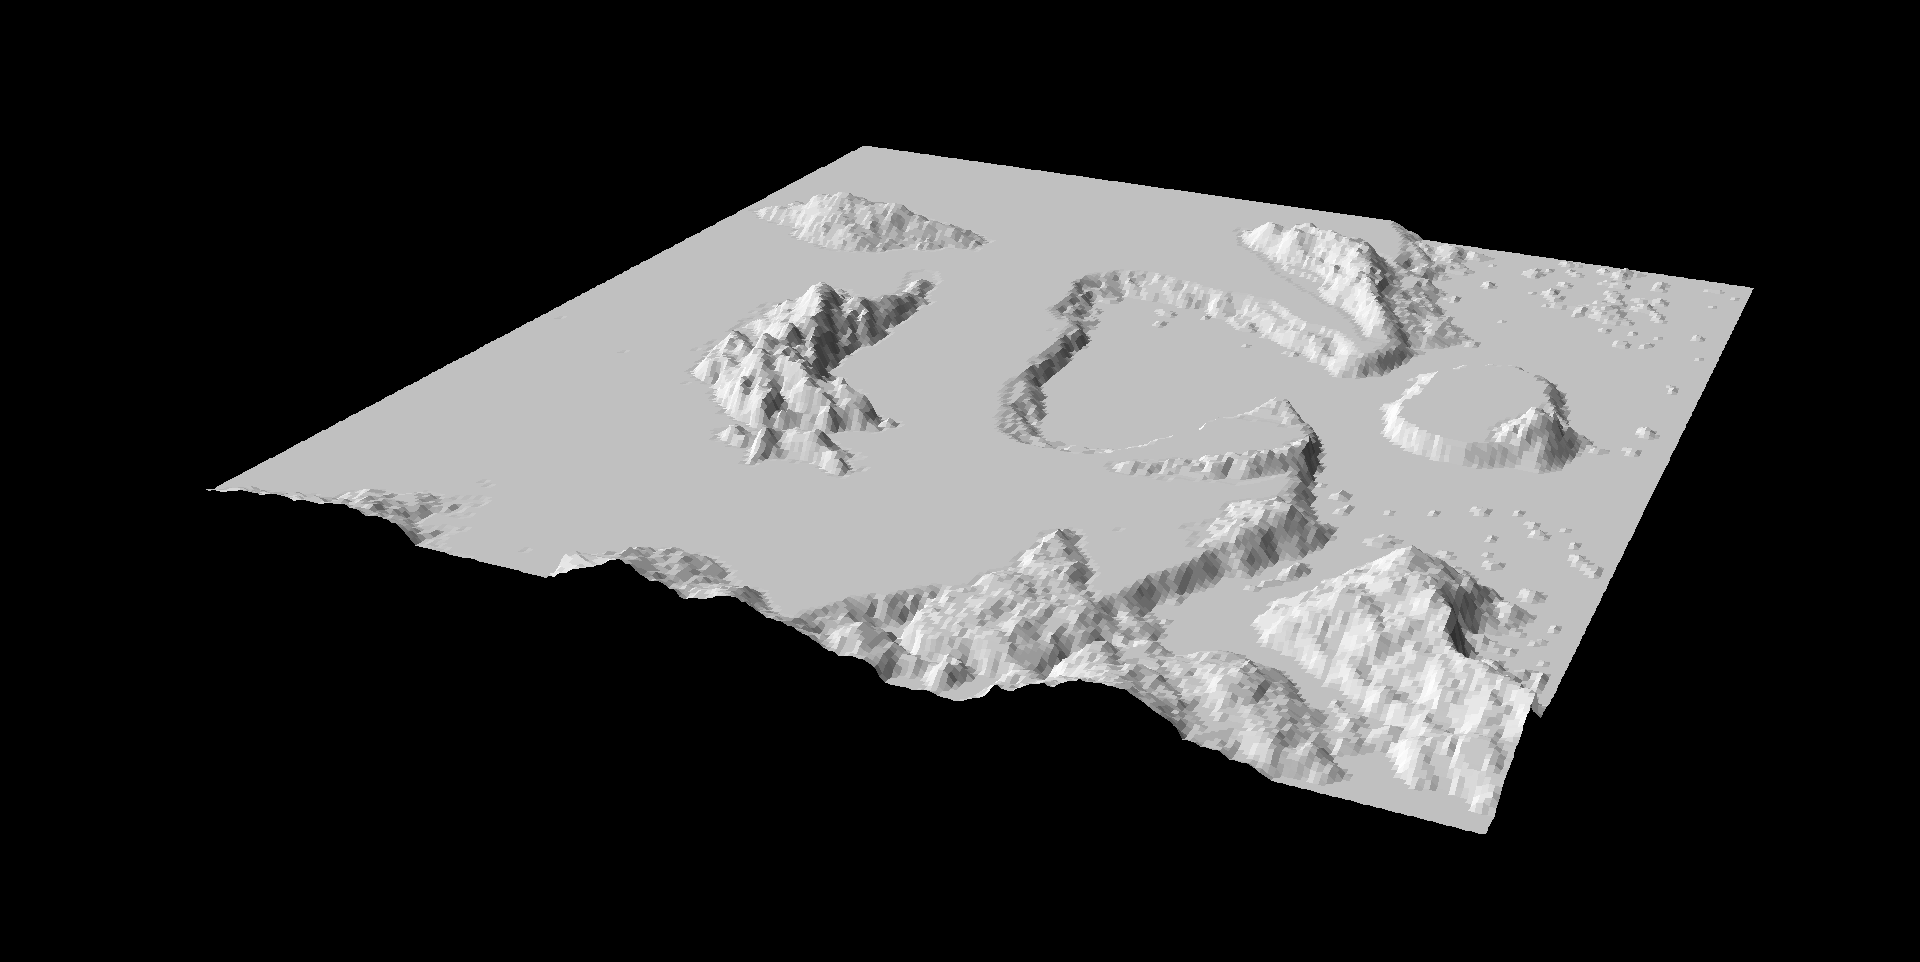 https://neorail.jp/forum/uploads/map_akari_init_heightmap_R_0.5_0621-1700.png